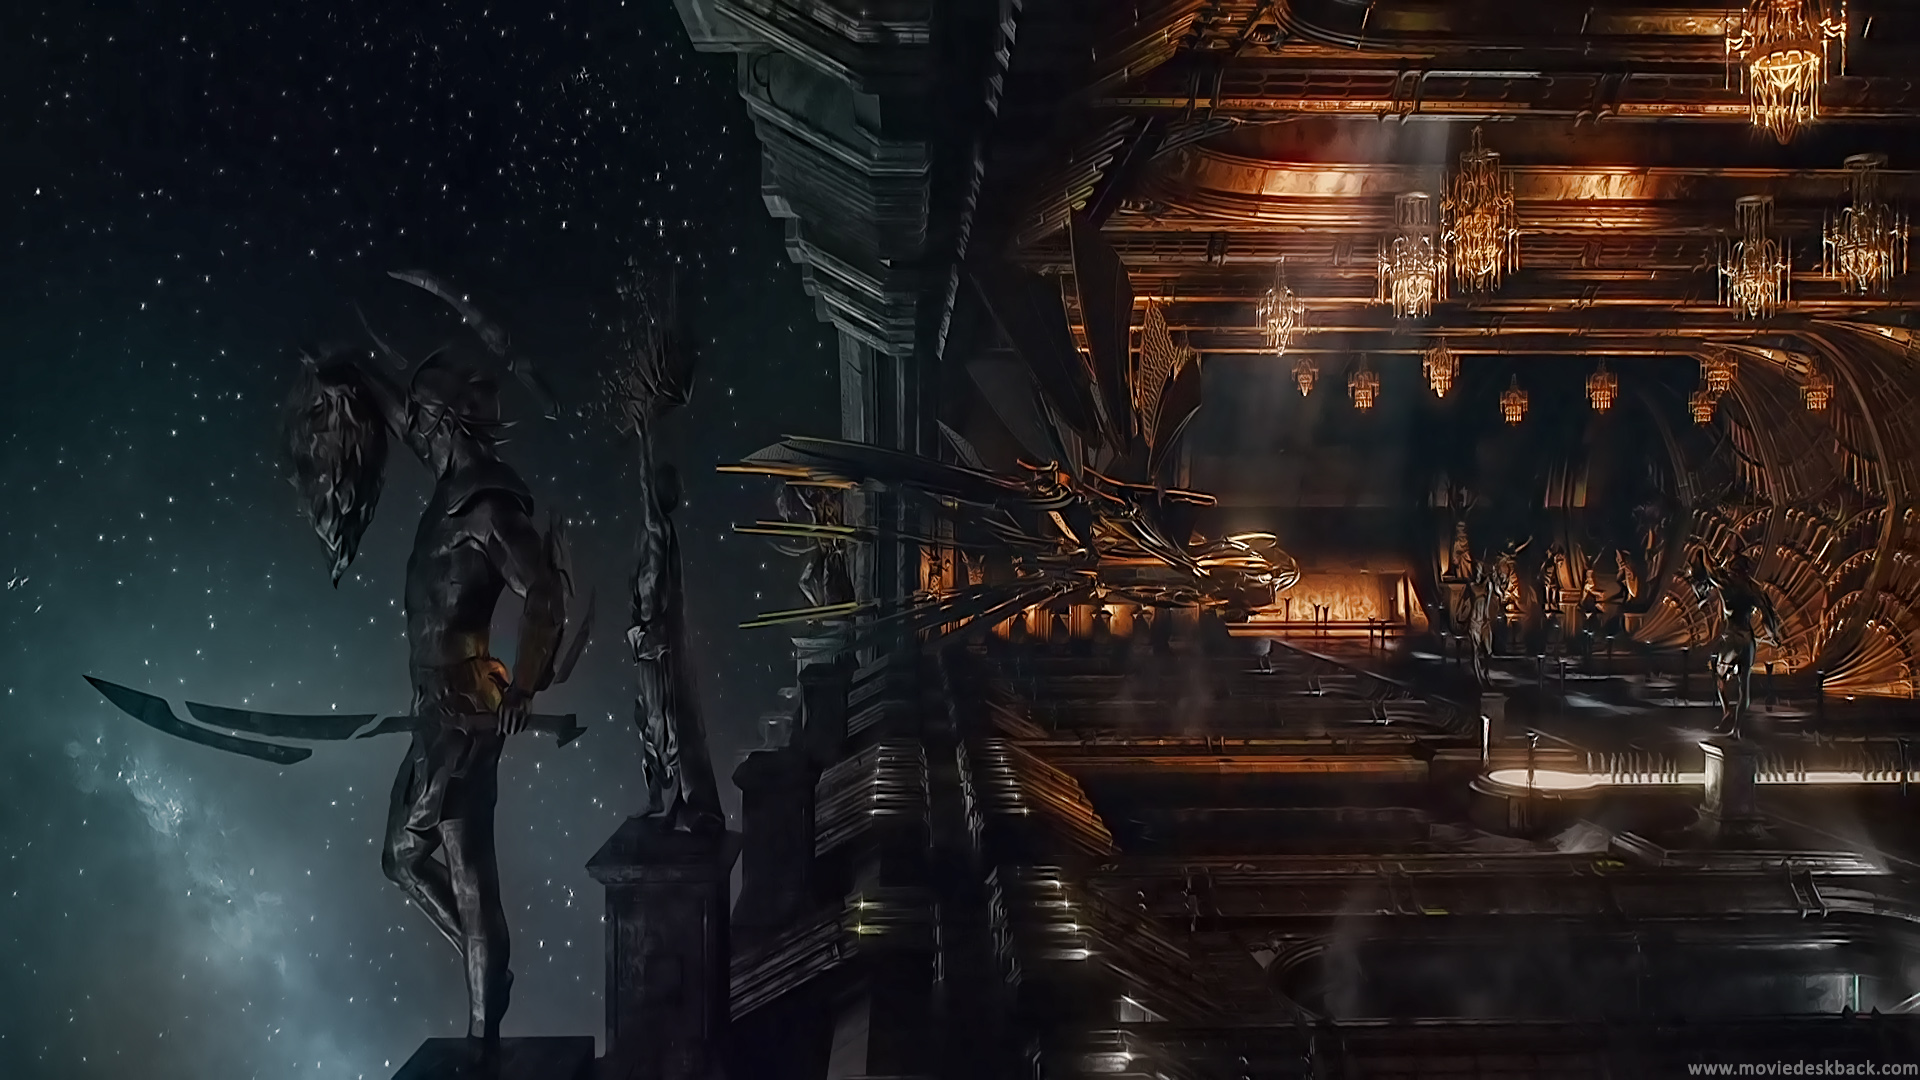 Jupiter Ascending Retina Movie Wallpaper: Jupiter Ascending HD Wallpaper